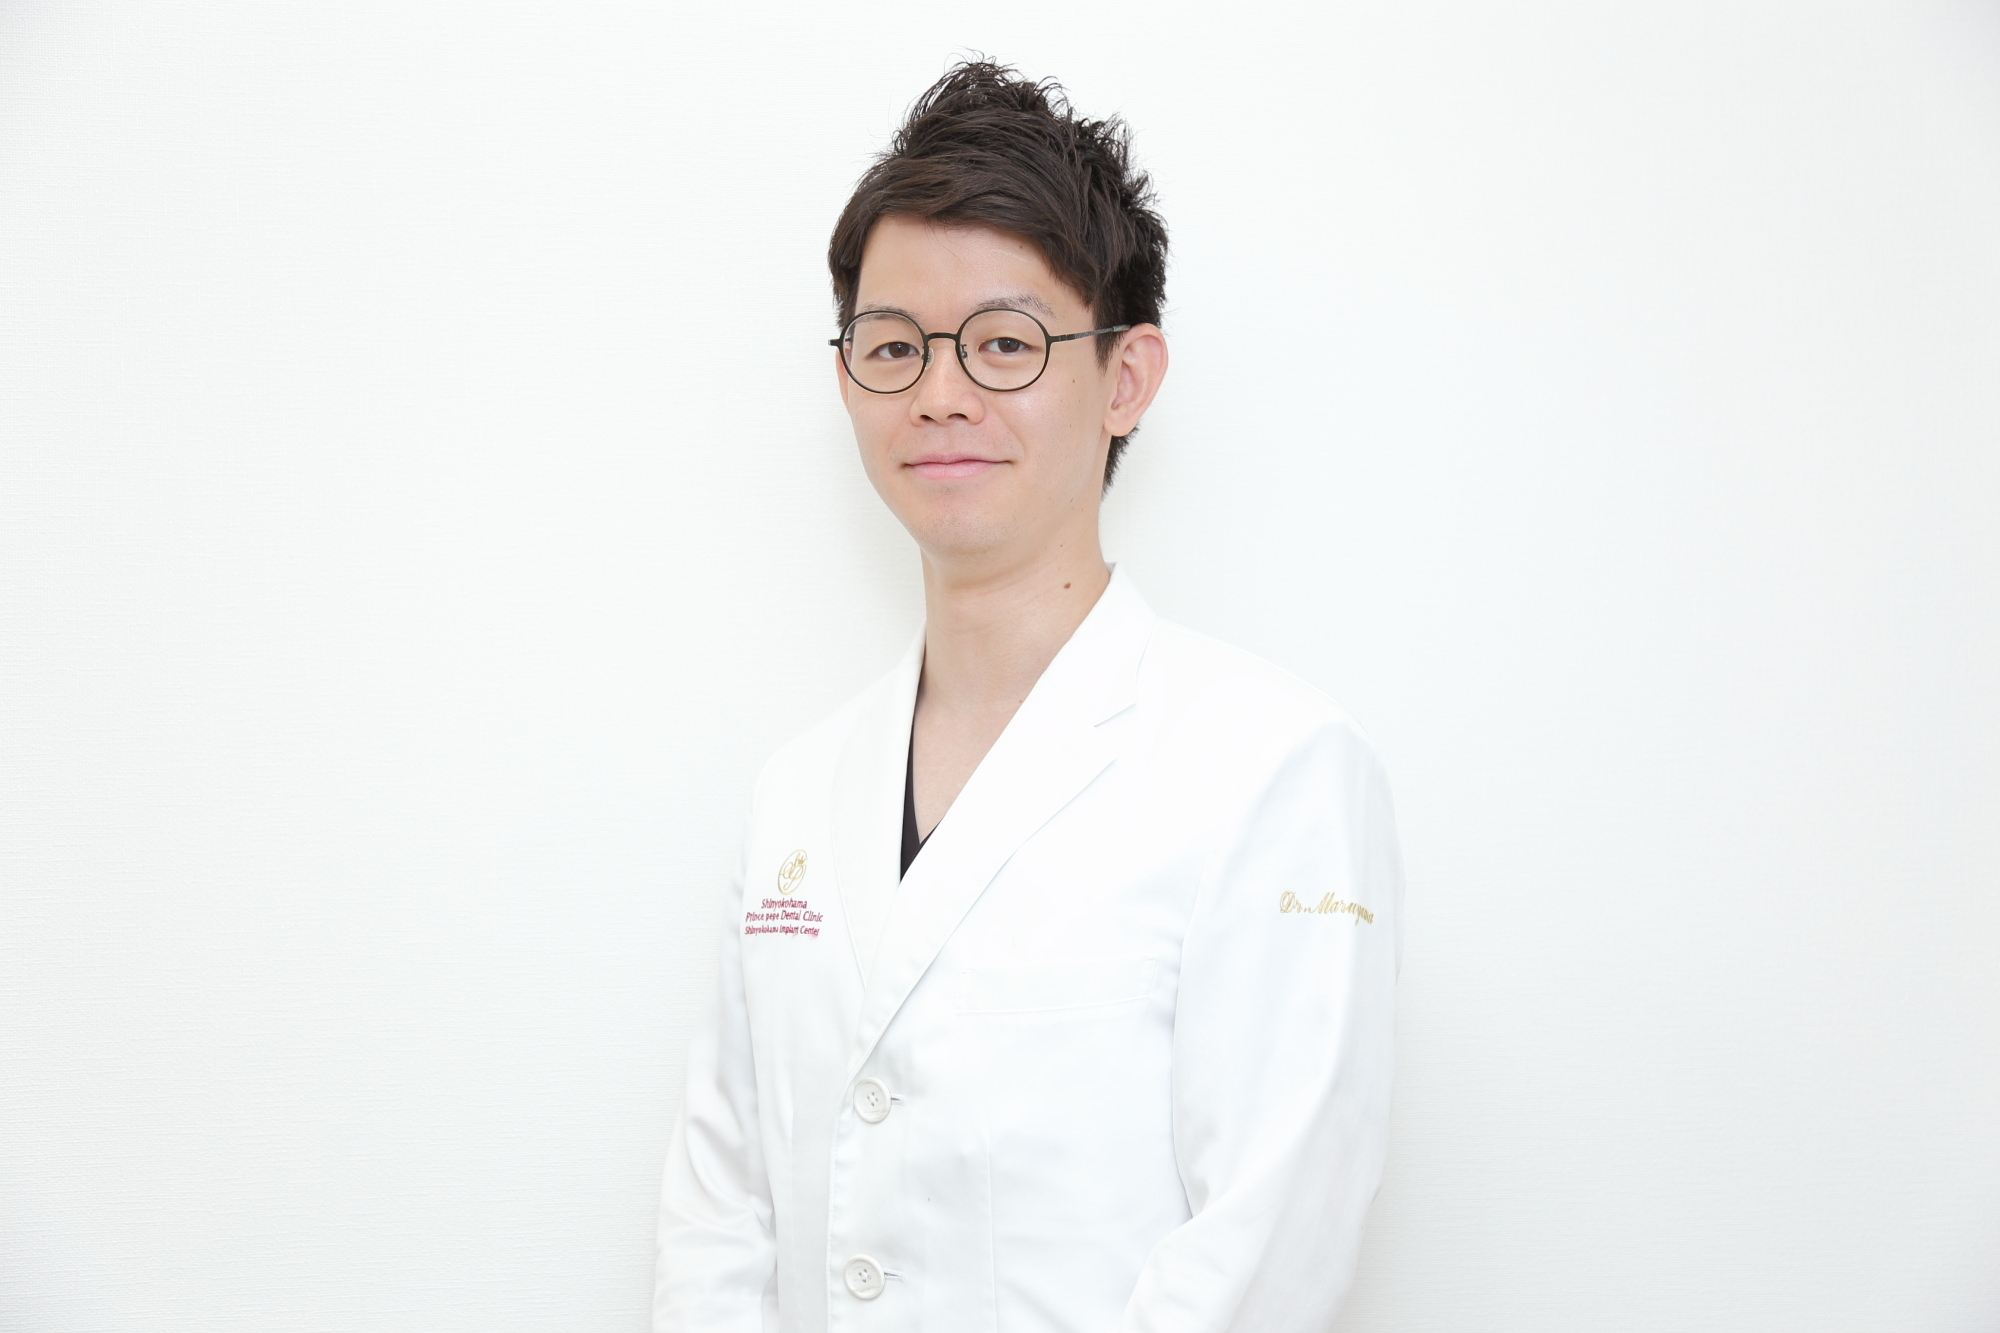 丸山泰典 YasunoriMaruyama